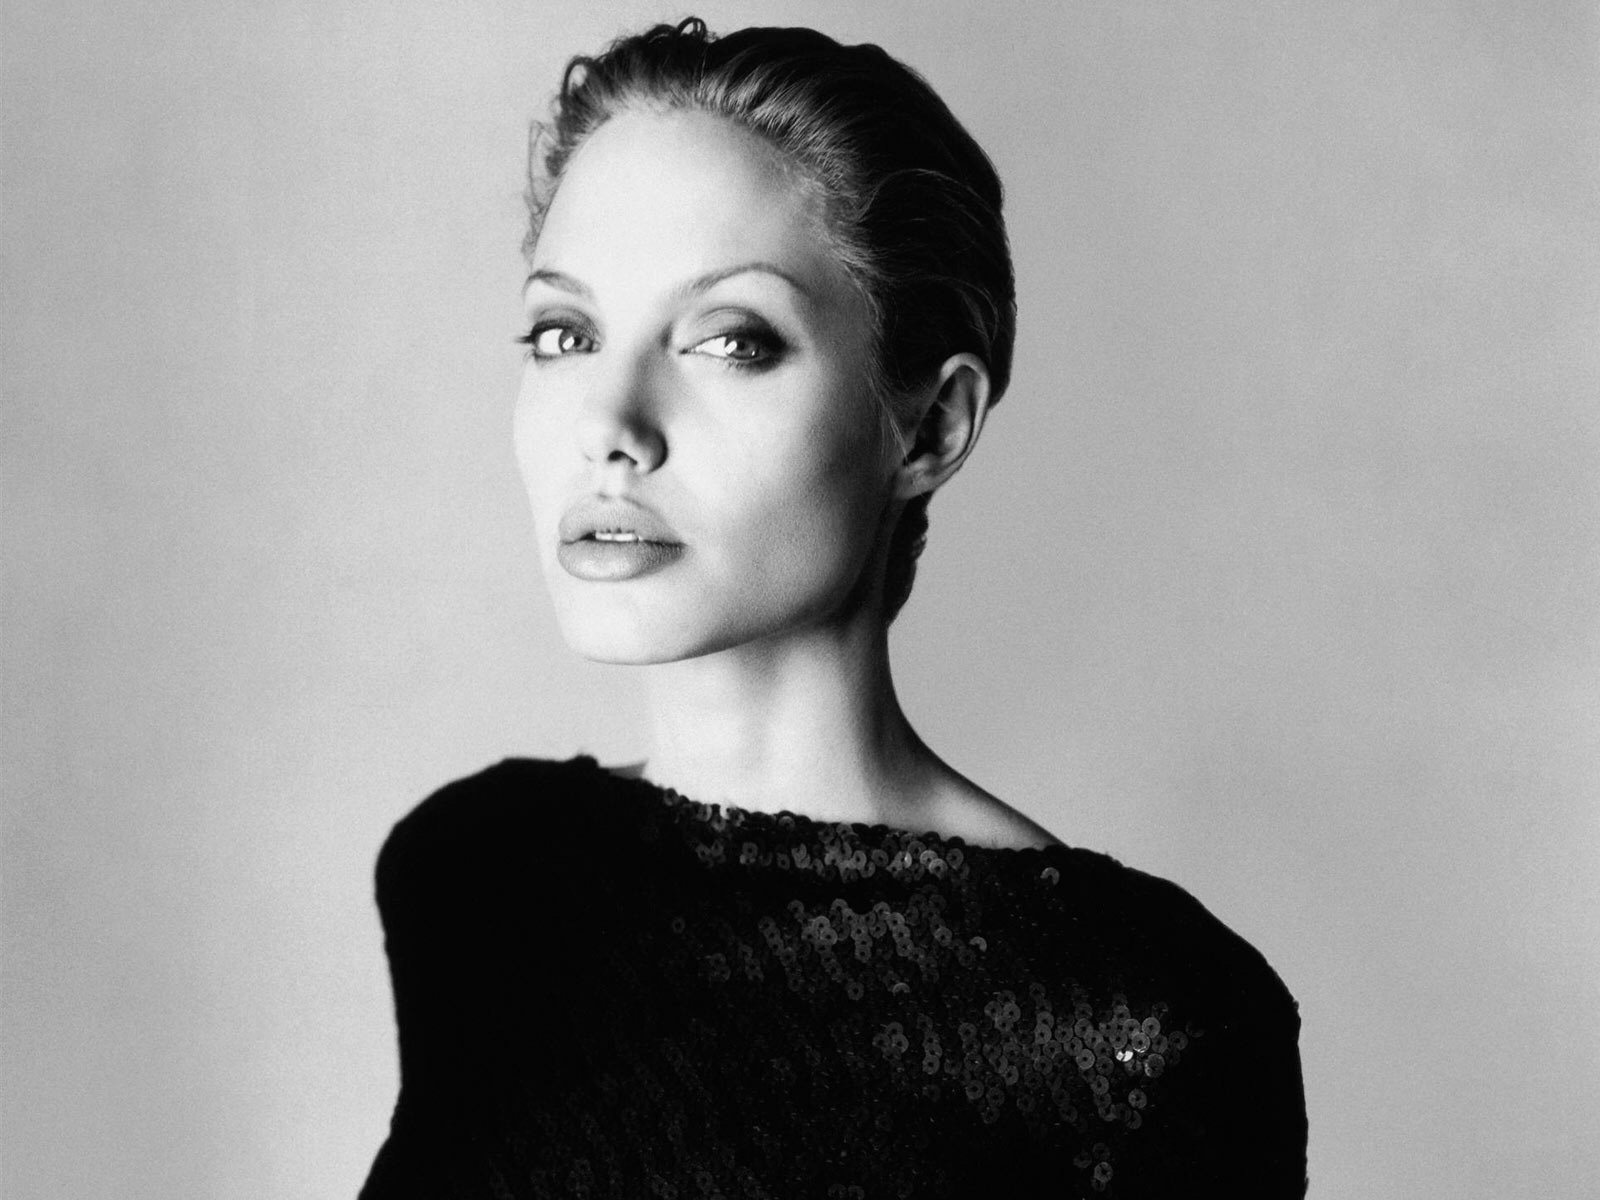 http://1.bp.blogspot.com/-kR4D4r-mcHA/TlDqfeqKs3I/AAAAAAAAHHA/7EgMt8FAjBE/s1600/Angelina_Jolie%252C_Photoshoot.jpg